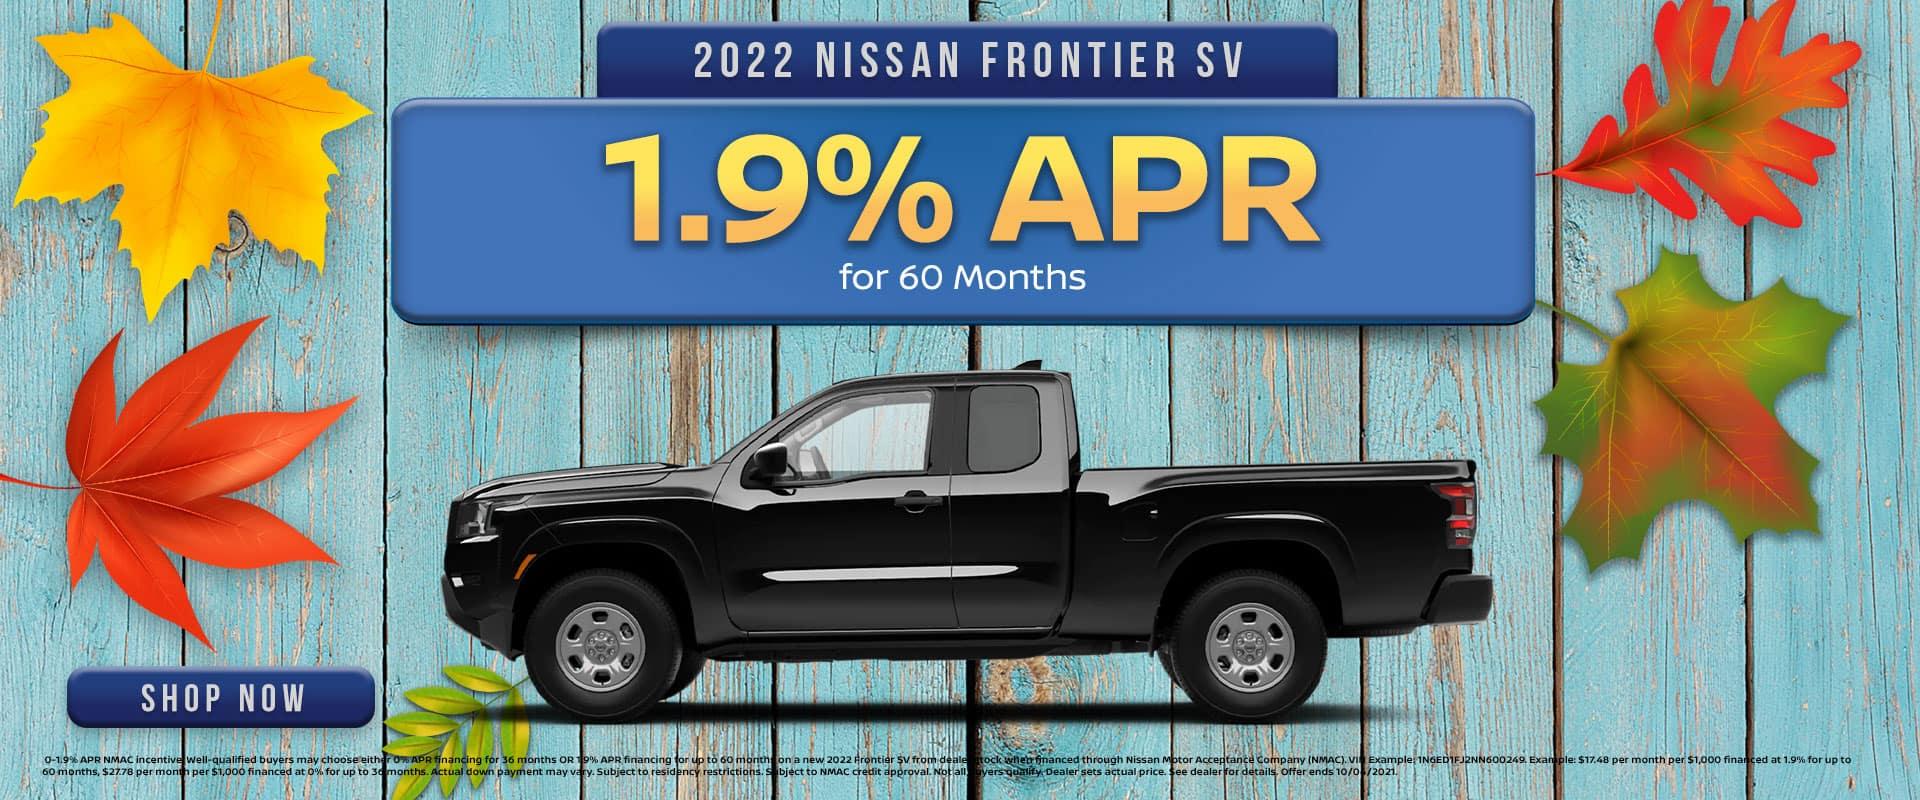 2022 Nissan Frontier Offer in Greenville, TX